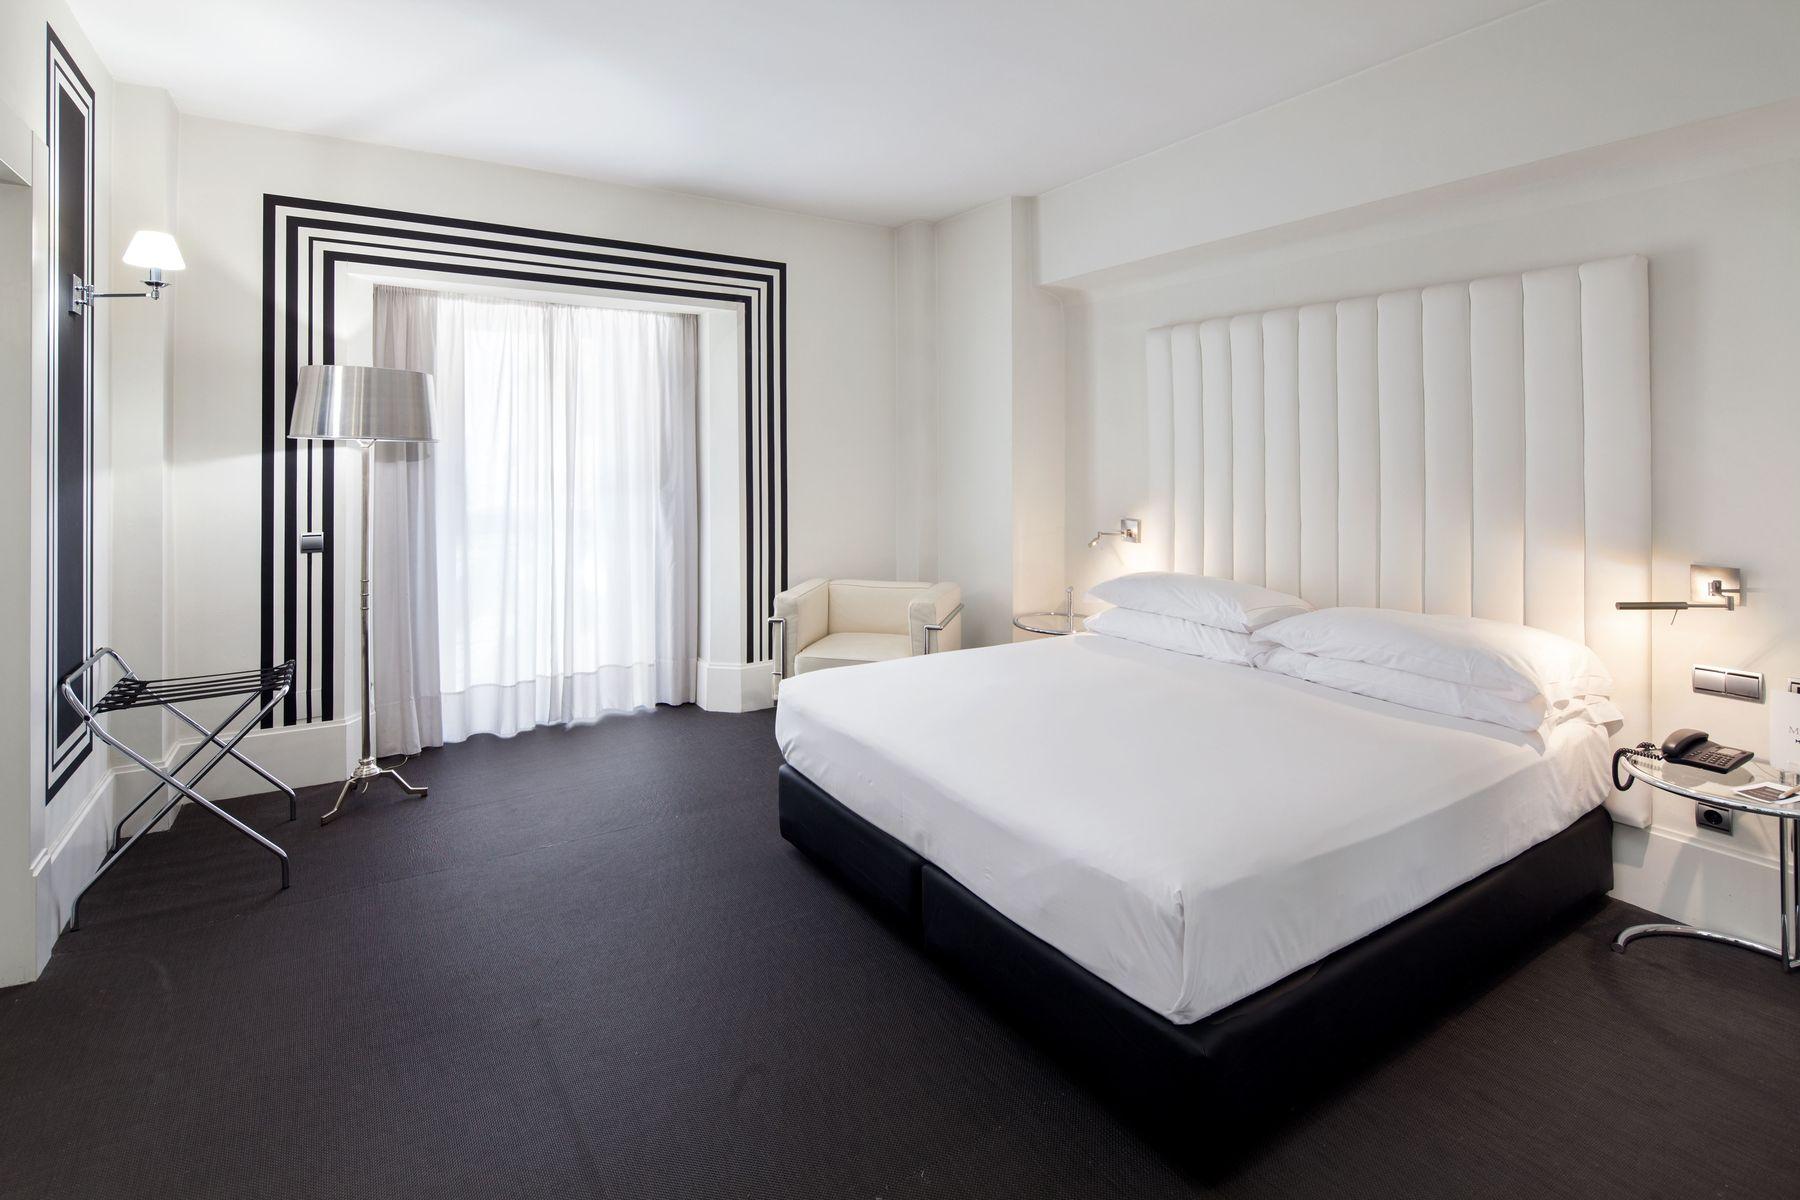 Hotel Mariposa, Malaga, Spain